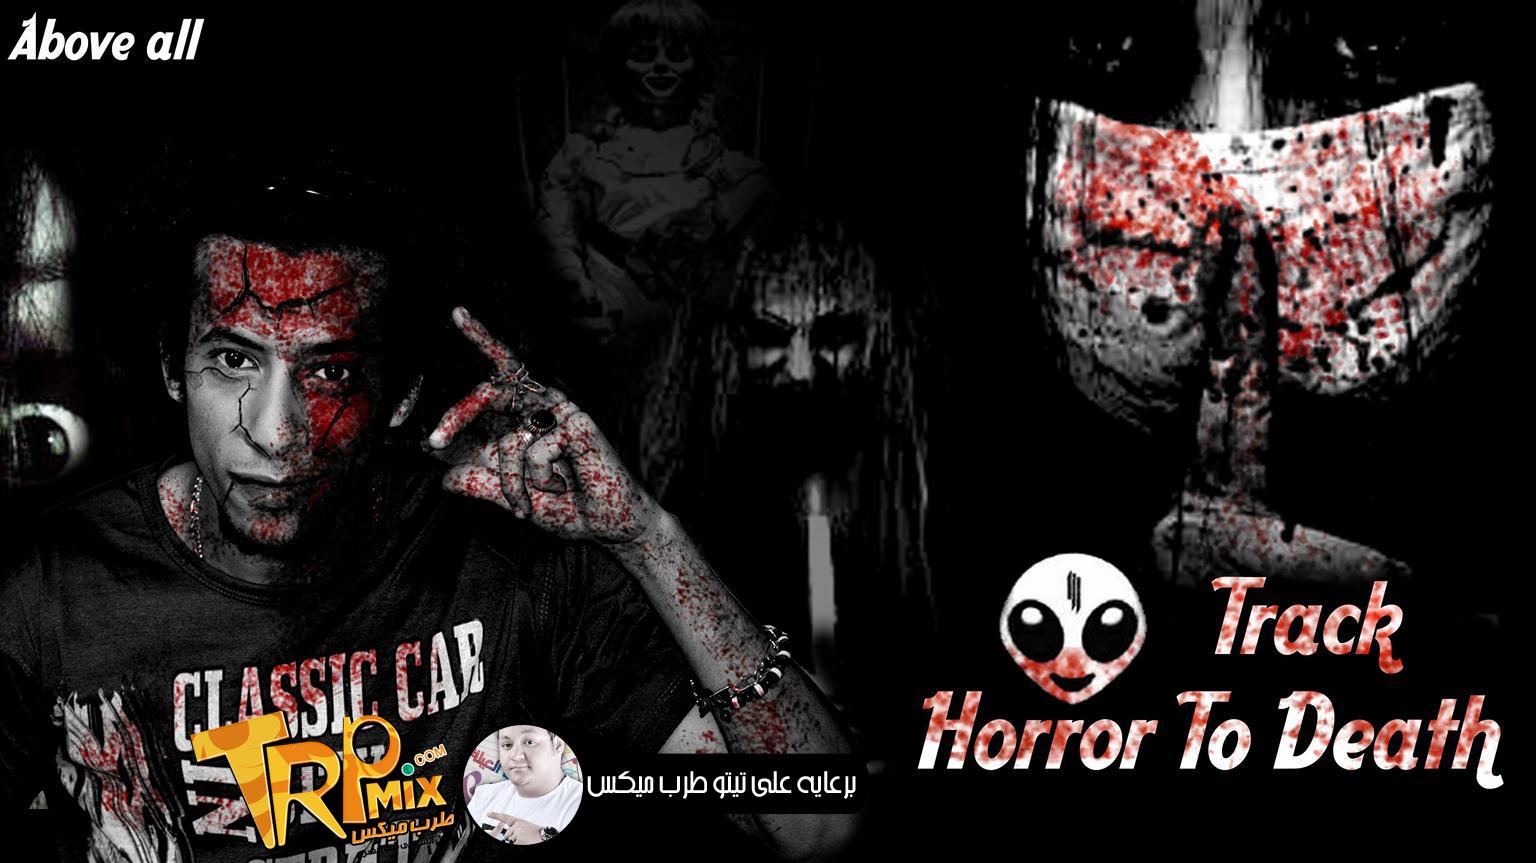 Horror To Death Dj Elbob Remix Trpmix.CoM By Ali Tito